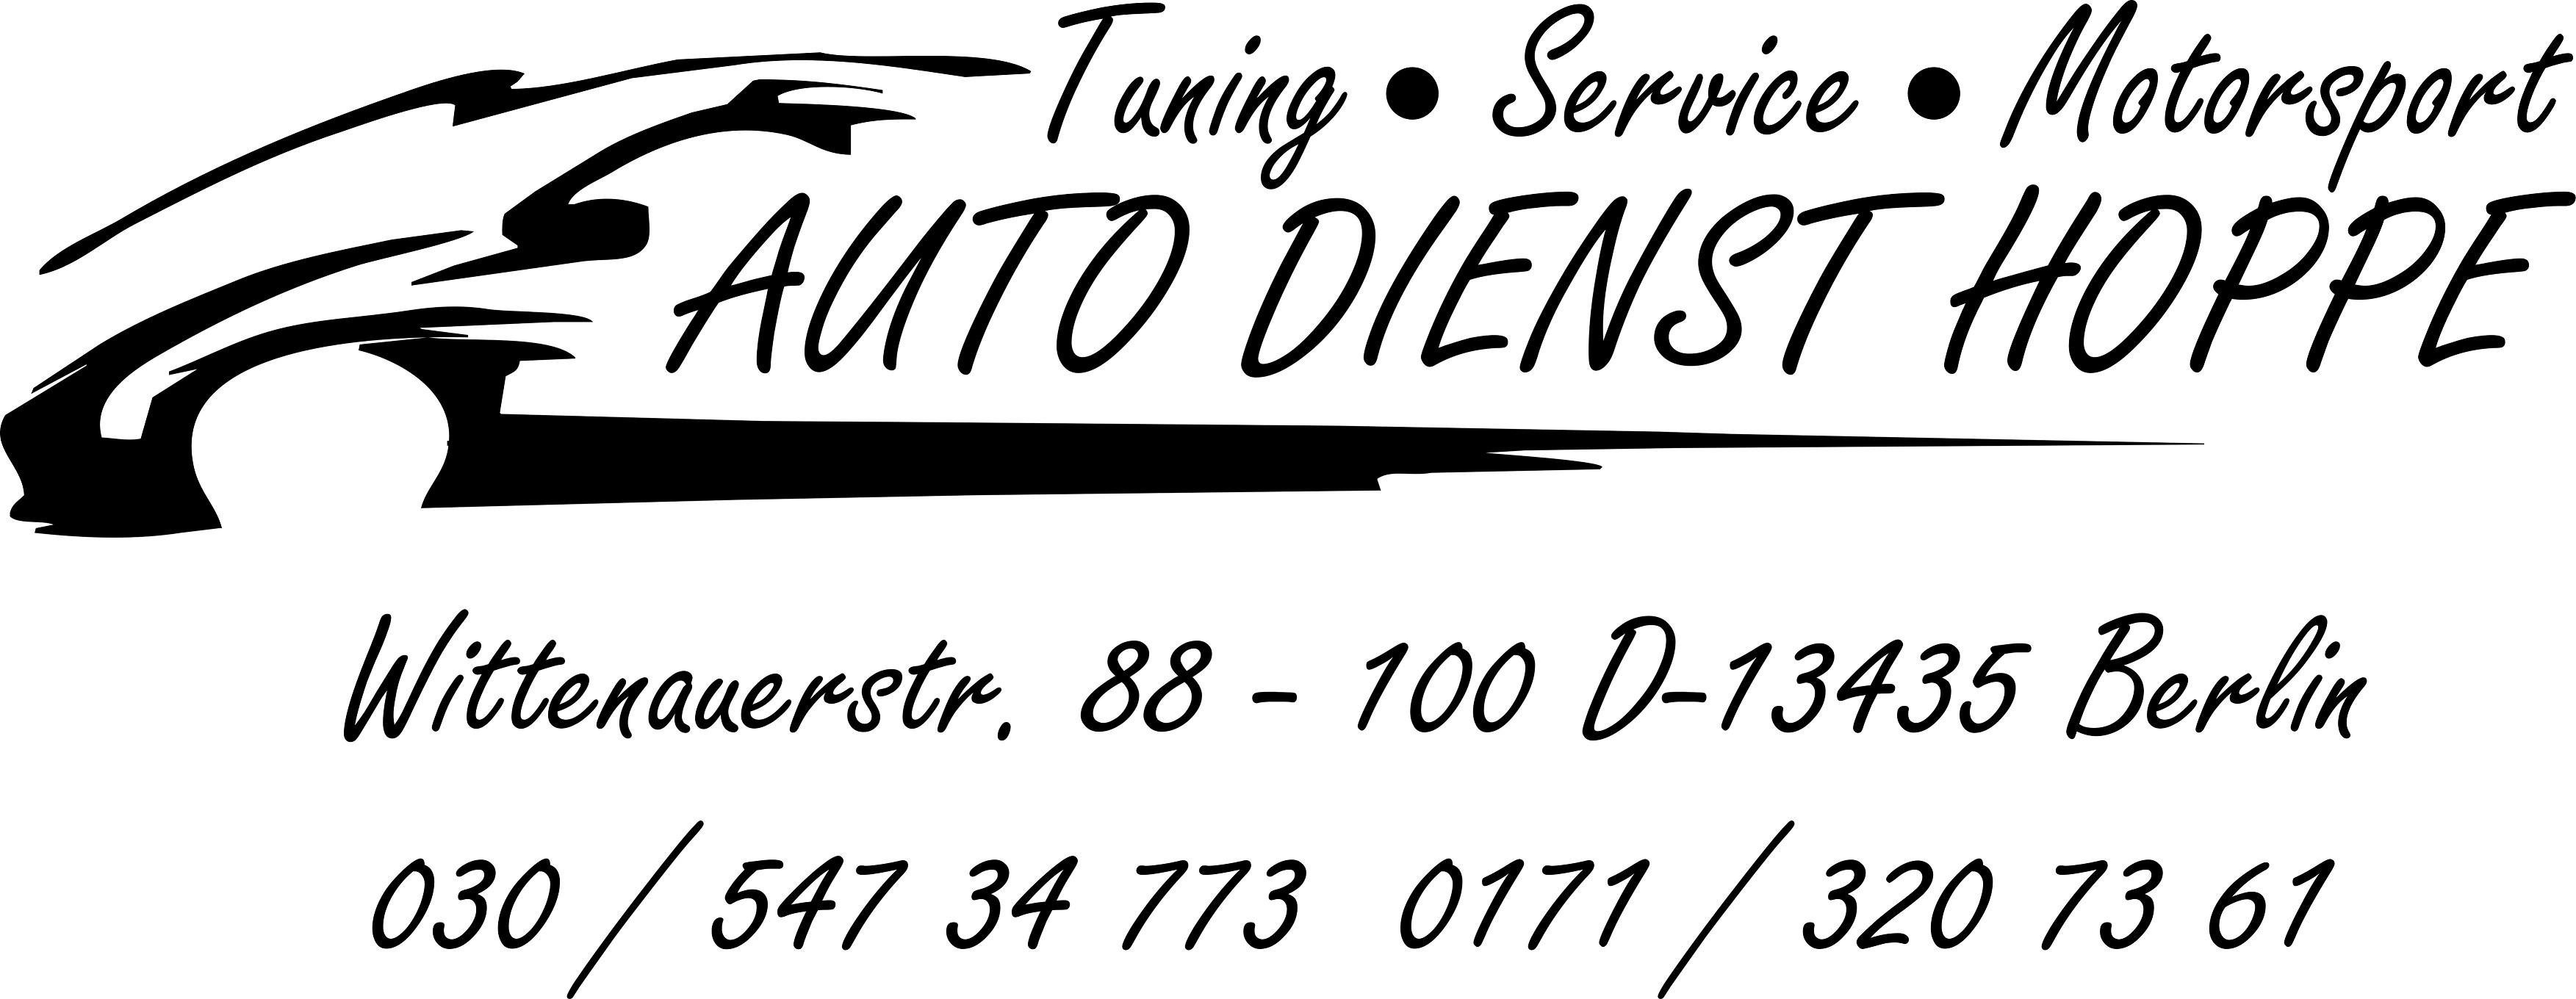 Auto Dienst Hoppe logo